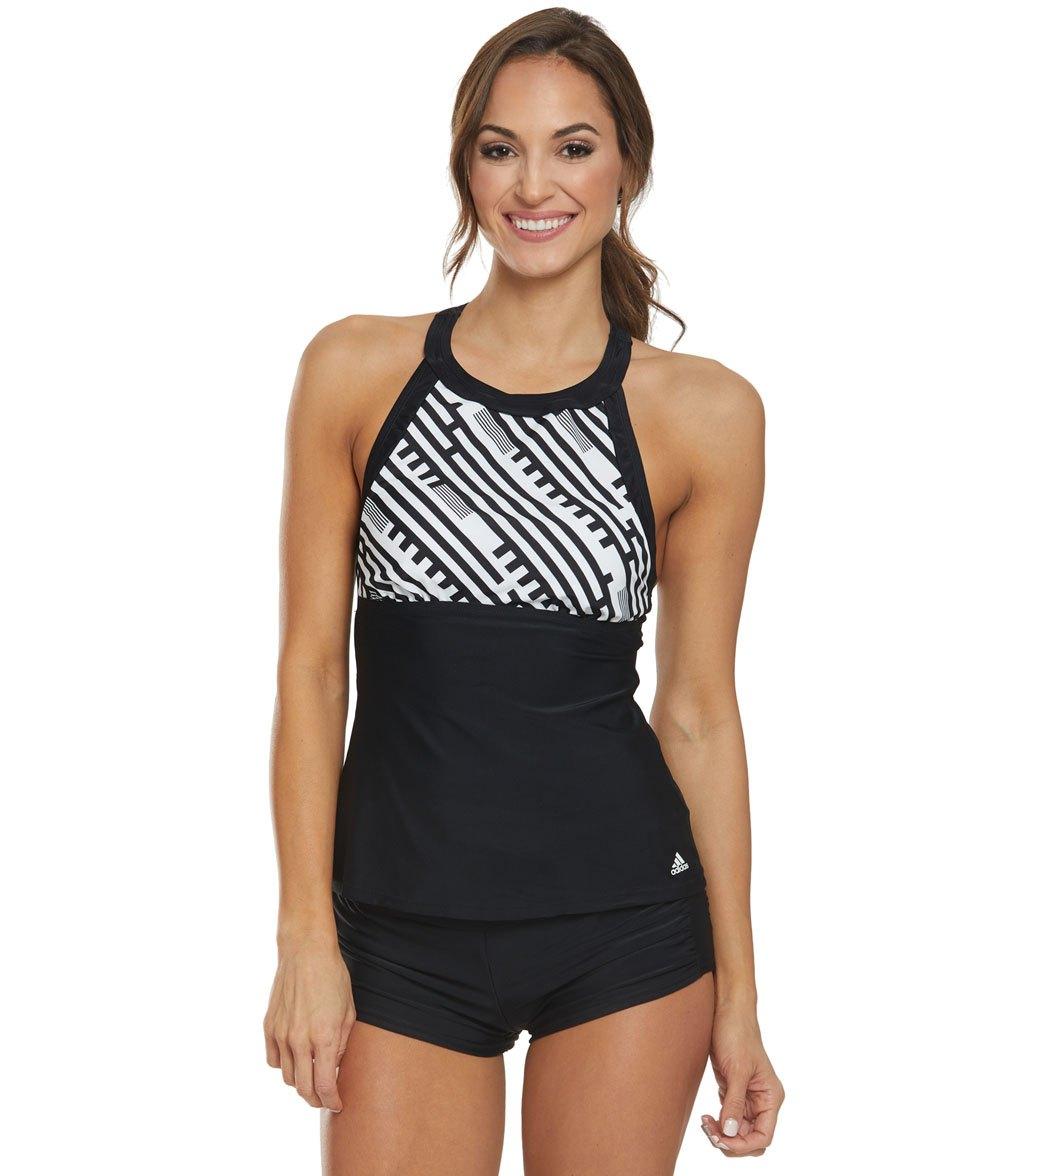 308a5c9953166 Adidas Optic Pop High Neck Tankini Top at SwimOutlet.com - Free ...